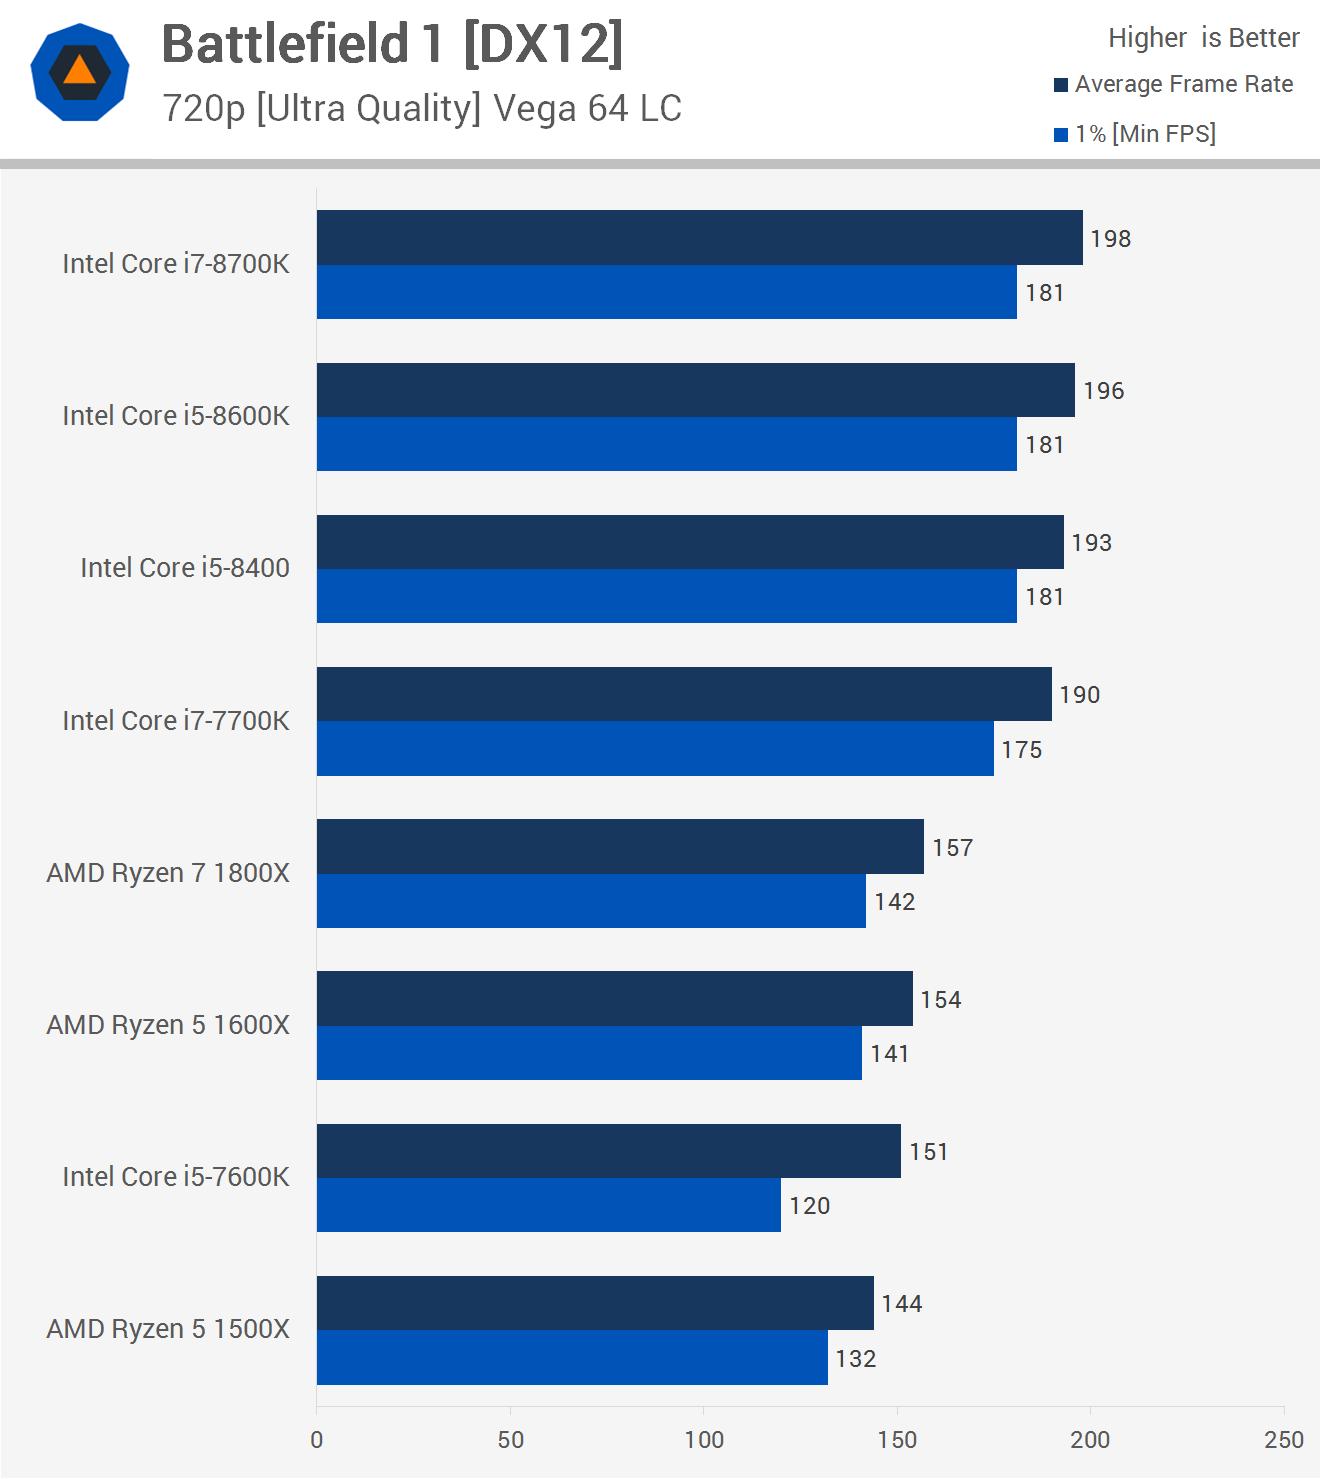 Intel Core i7-8700K ، i5-8600K ، 8400 مقابل AMD Ryzen 7 1800X ، R5 1600X ، 1500X 2